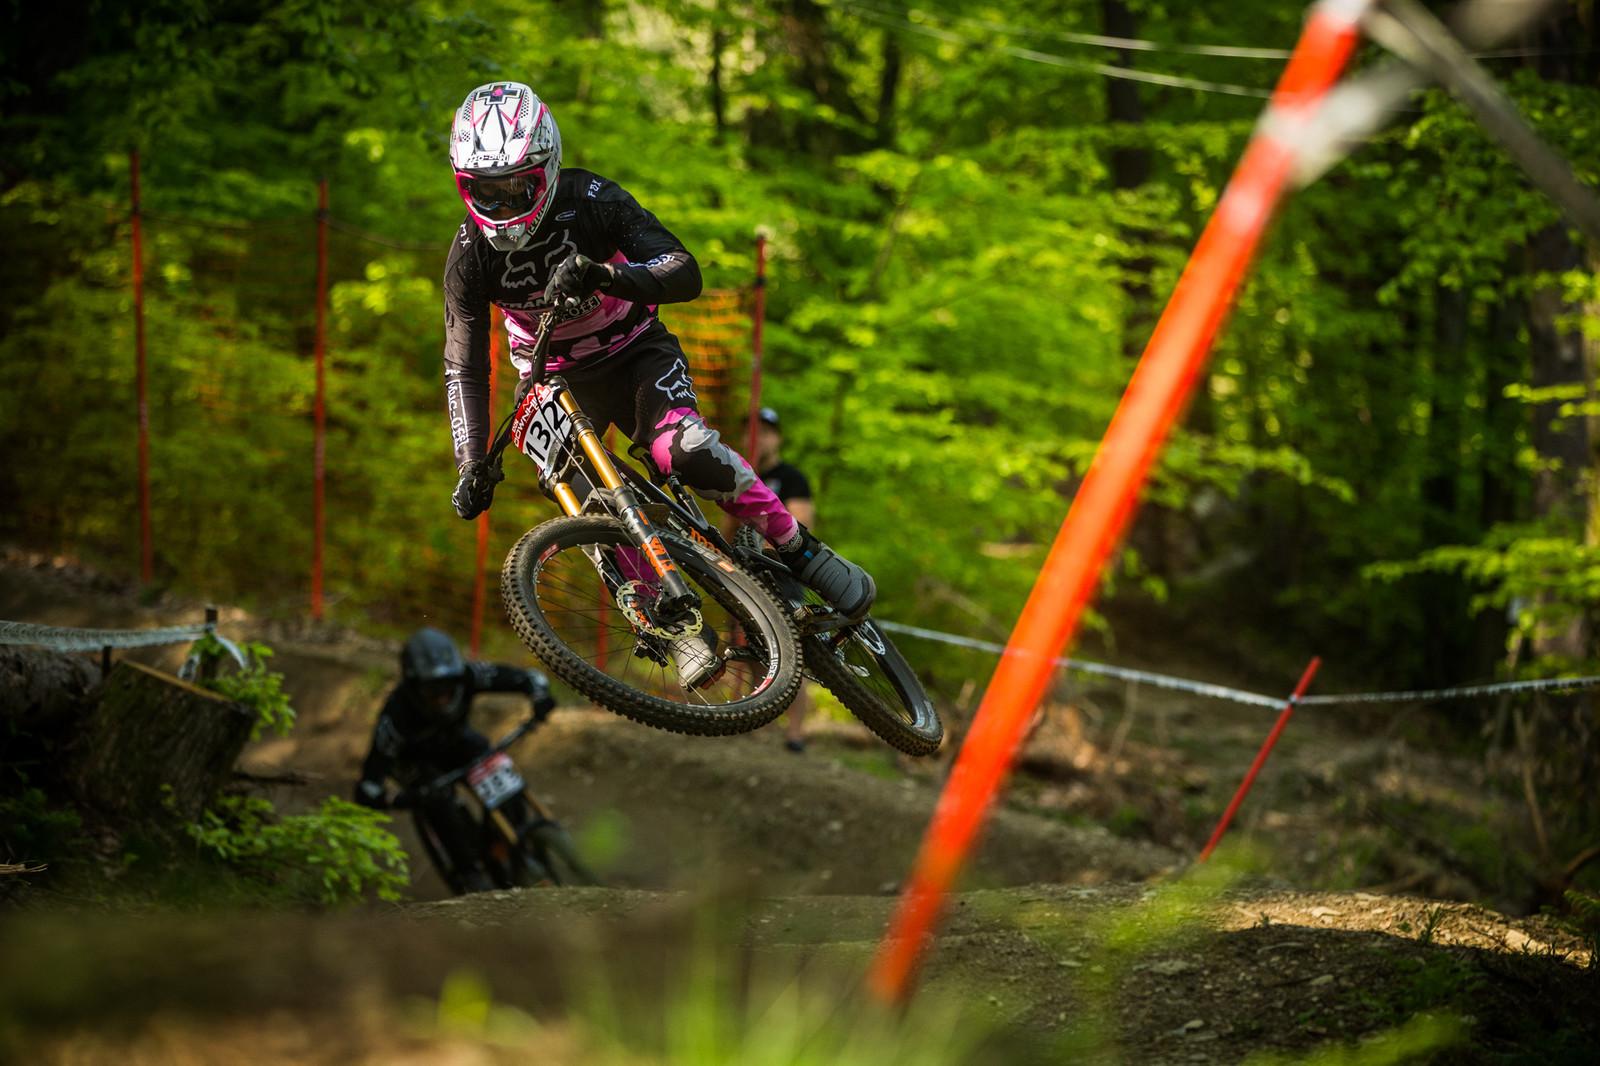 Kaos Seagrave - iXS Downhill Cup Maribor - Race Gallery - Mountain Biking Pictures - Vital MTB